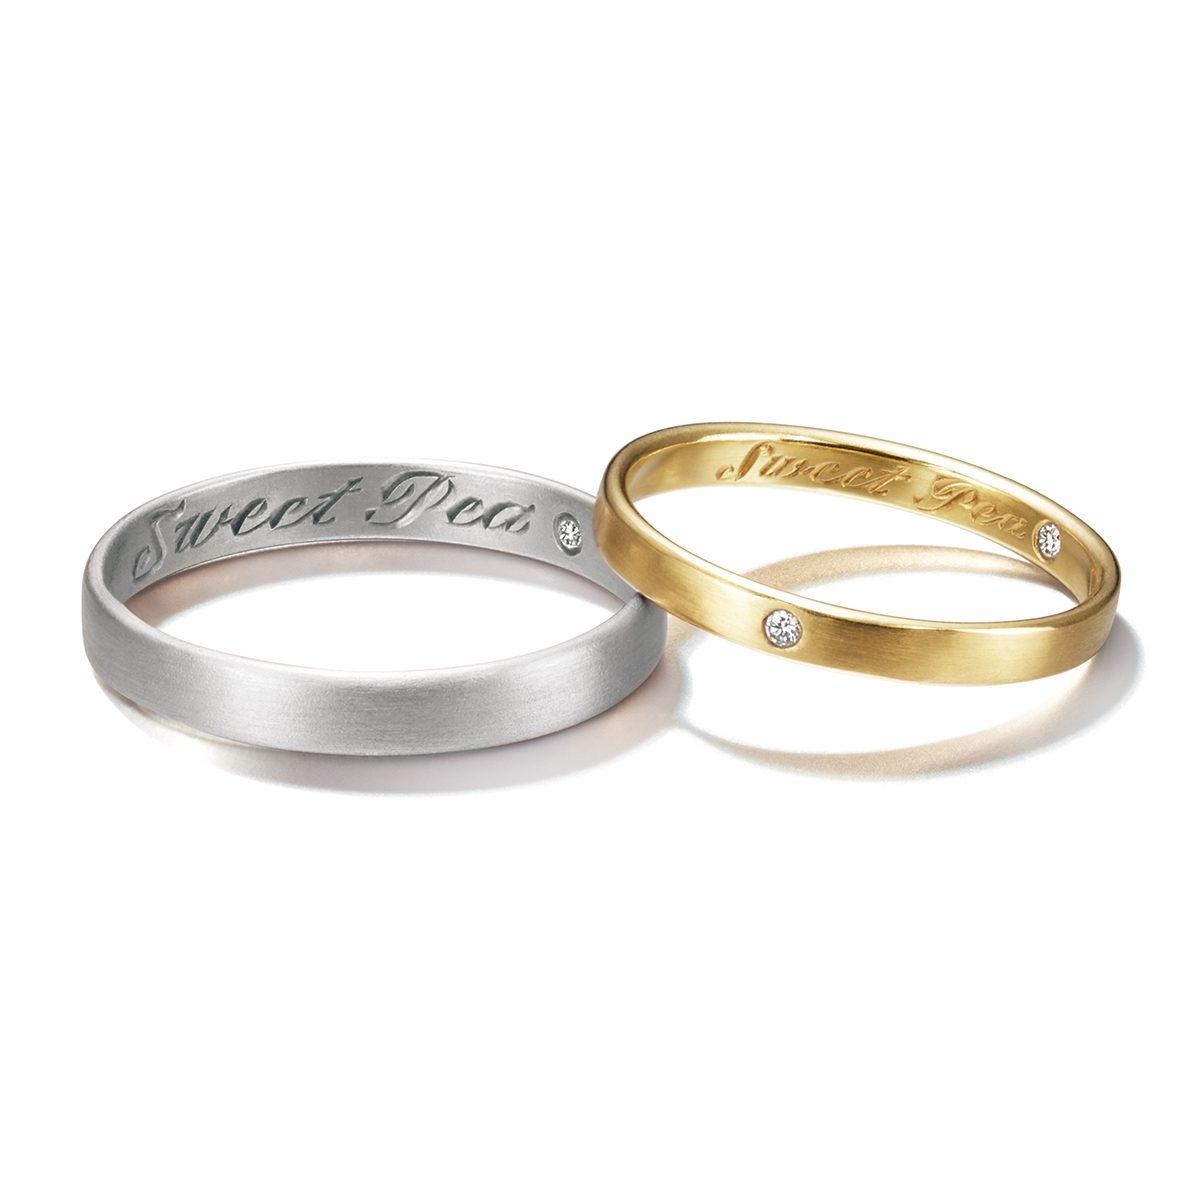 Sweat Pea - Satin Ring Marriage Rings